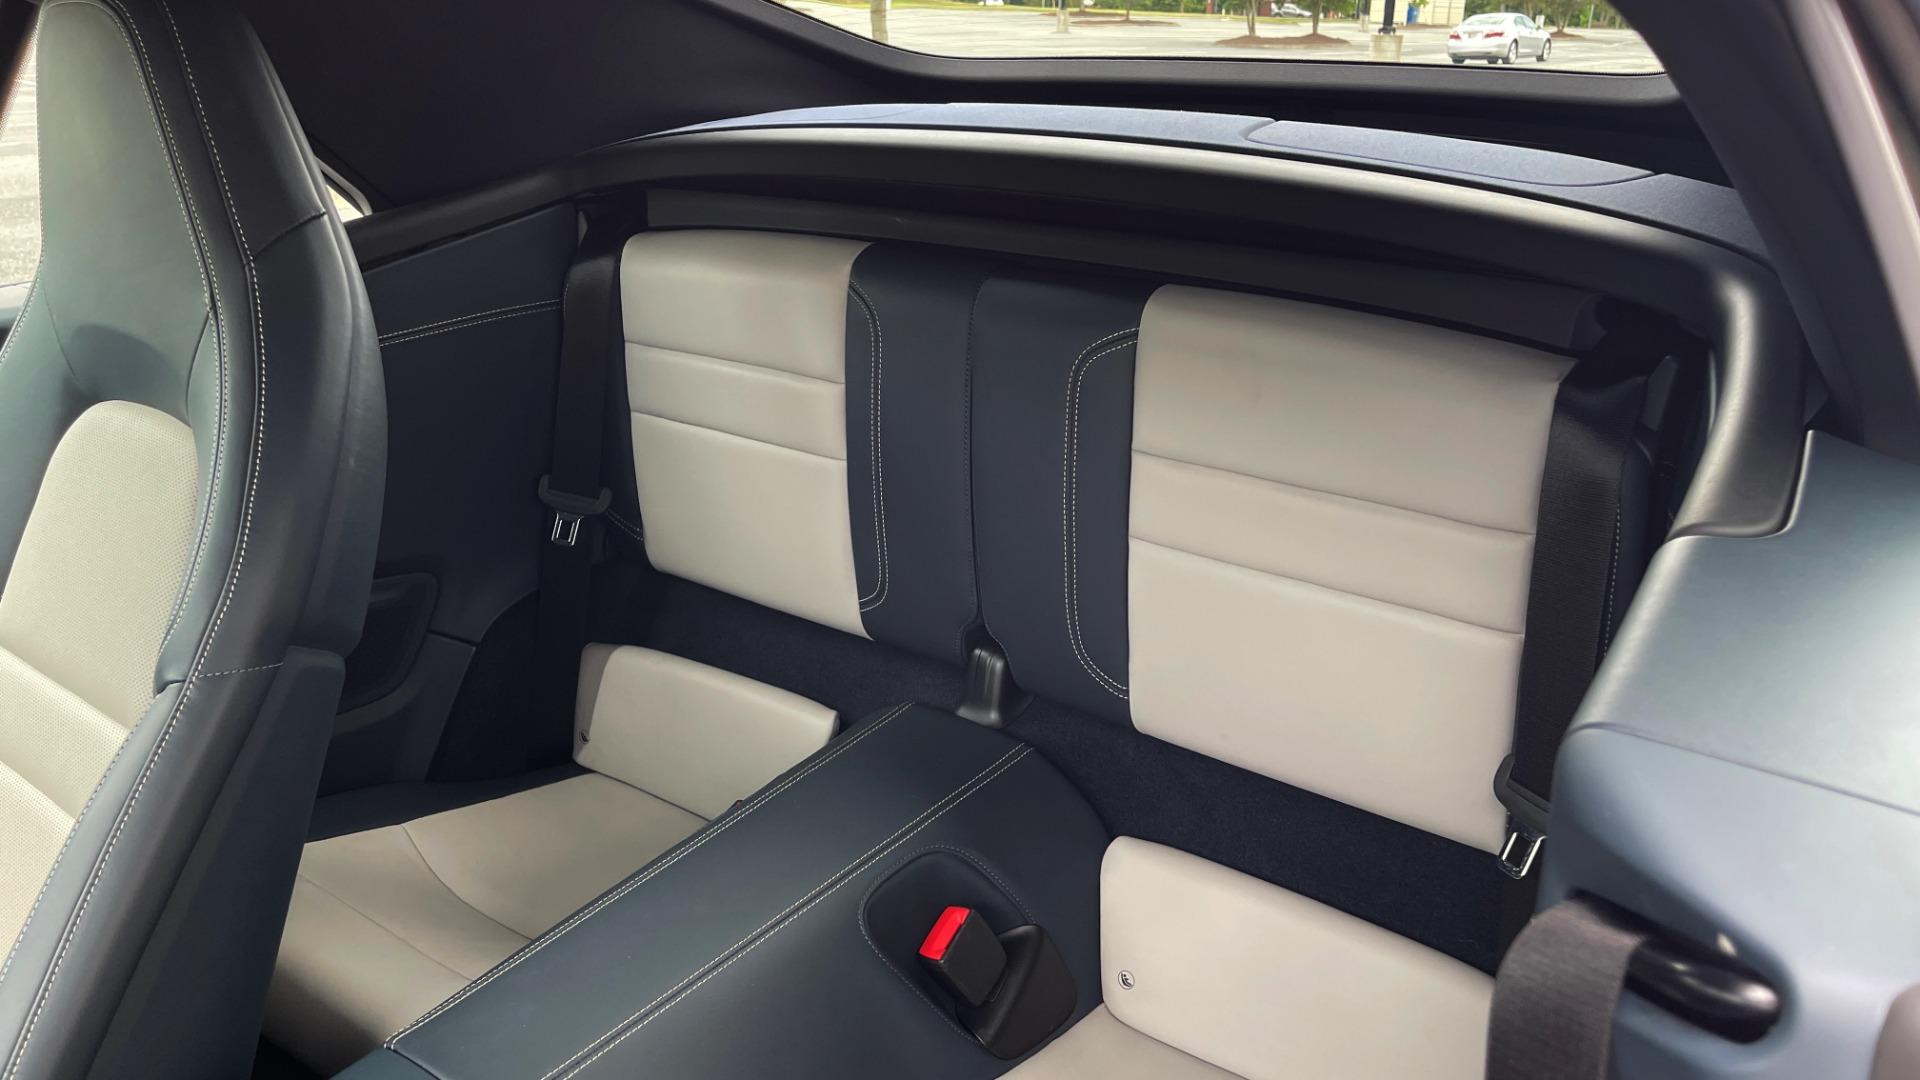 Used 2020 Porsche 911 CARRERA 4S CABRIOLET PREMIUM SPORT PKG / NAV / BOSE / LIGHT DESIGN PKG for sale $167,595 at Formula Imports in Charlotte NC 28227 48